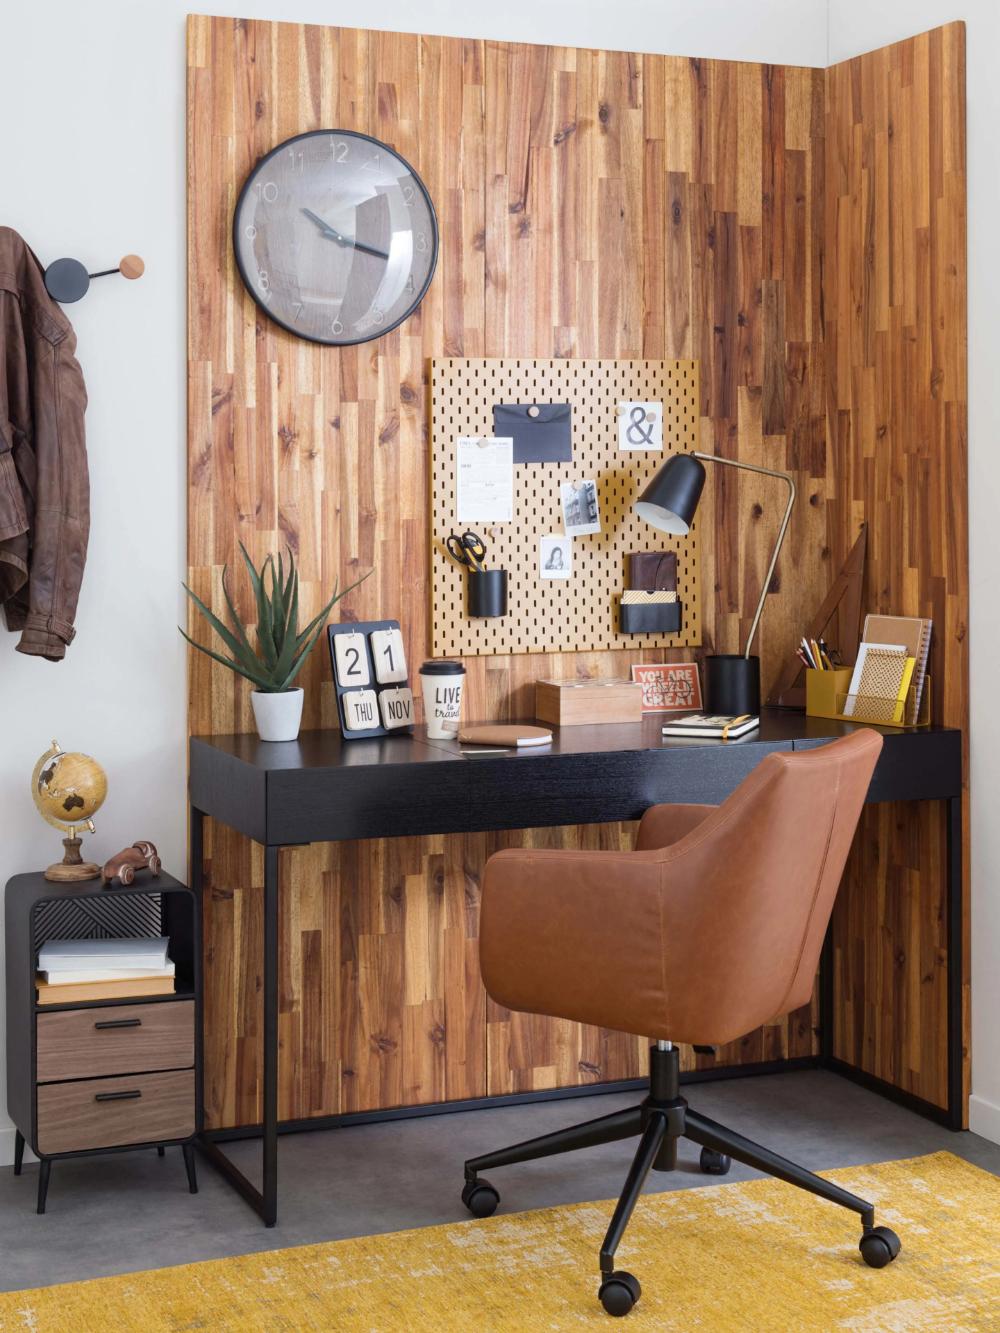 Tendenza D Arredo Boston Maisons Du Monde Trending Decor Furniture Desk With Drawers